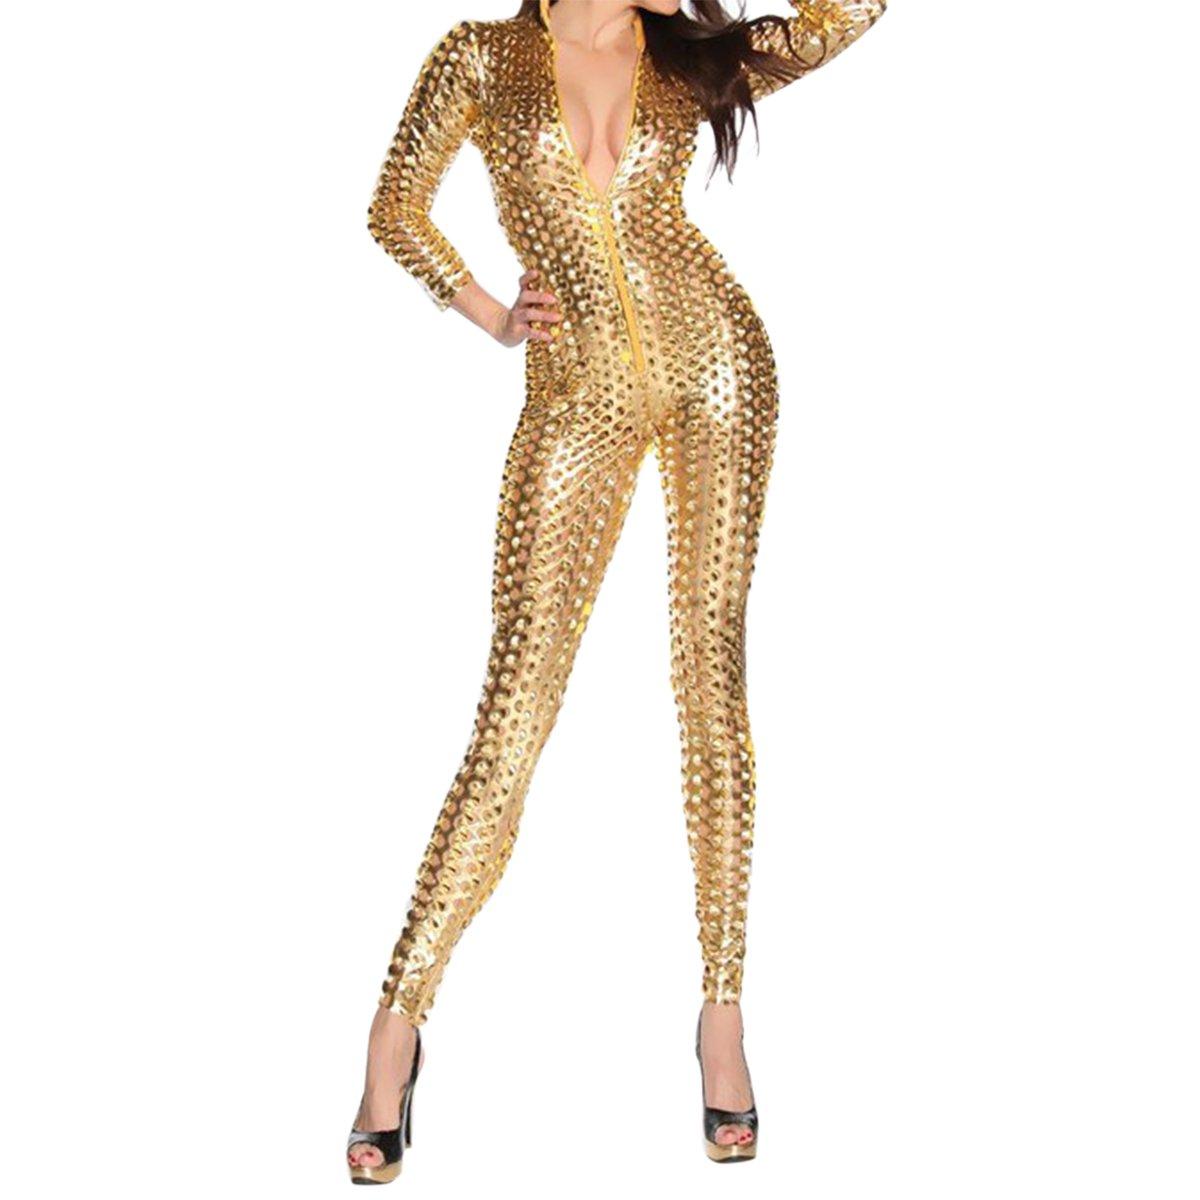 a2c5748ee5 Amazon.com  Quesera Women s Sexy Hollow Catsuit One Piece Metallic Skinny  Stretch Bodysuit  Clothing